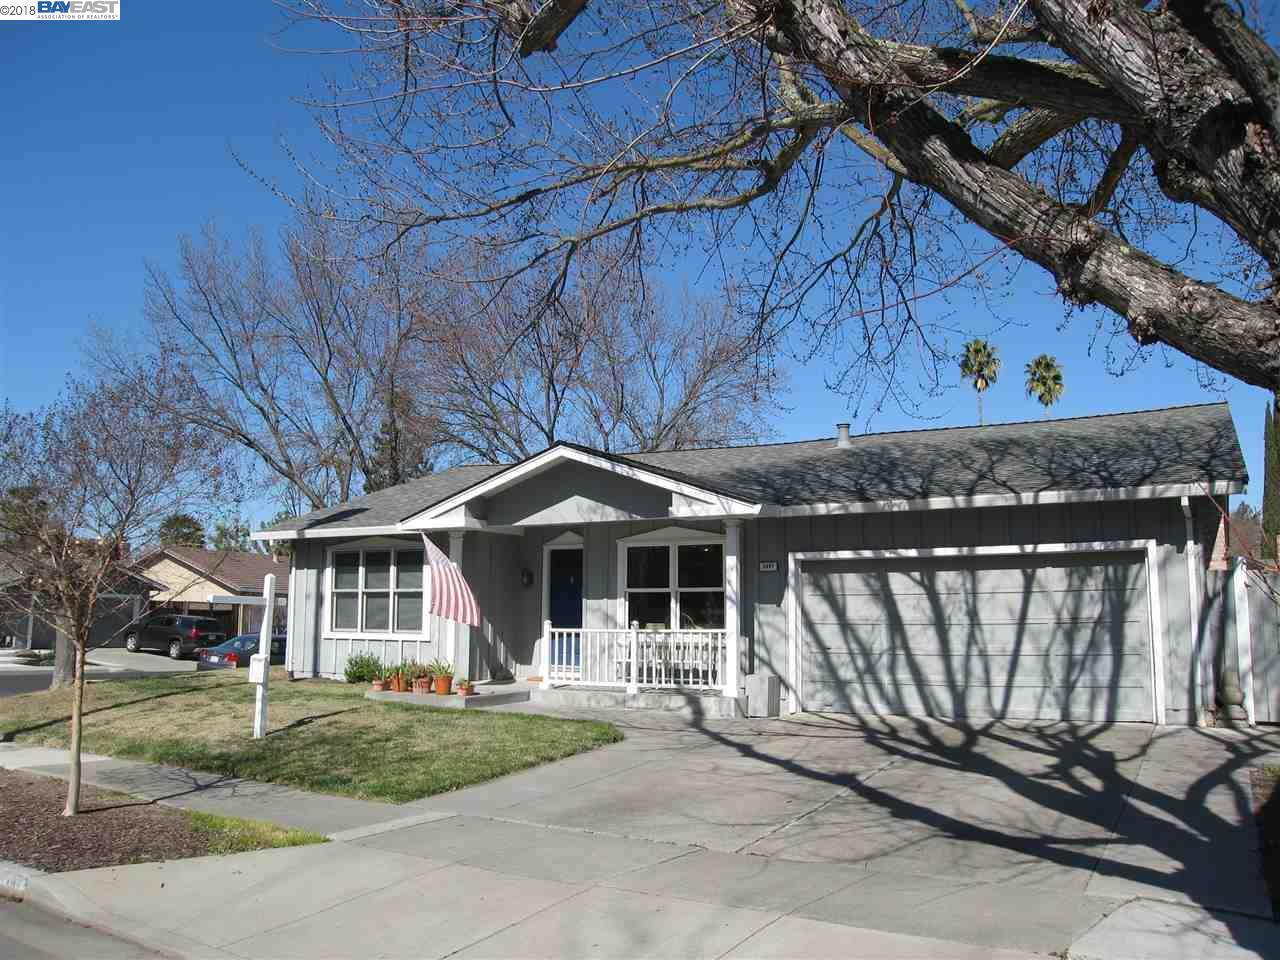 5397 Northway Rd, Pleasanton, CA 94566 | MLS# 40811365 | Redfin